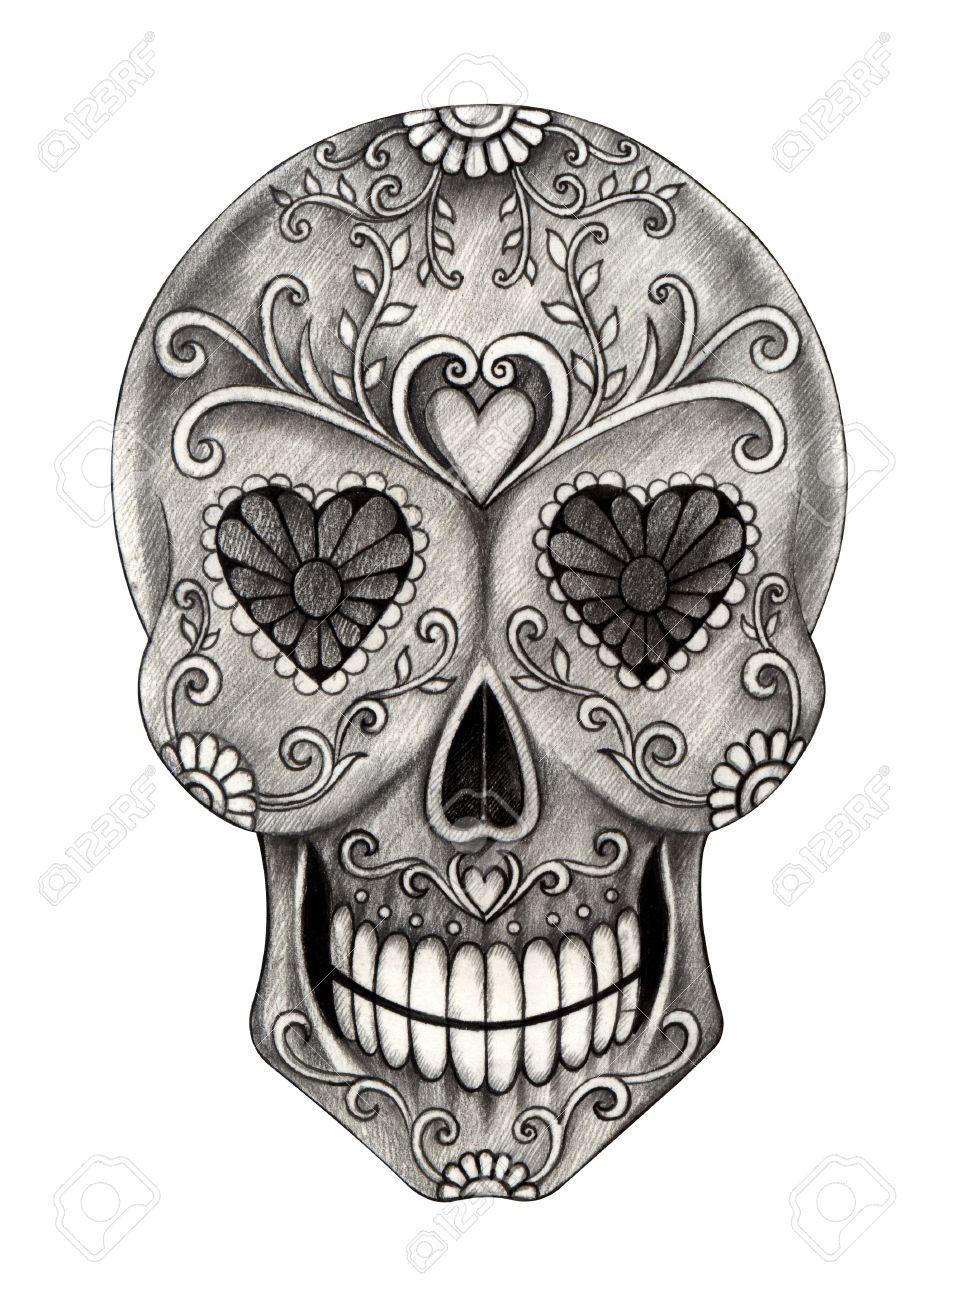 Stock Photo Skull artwork, Sugar skull artwork, Day of